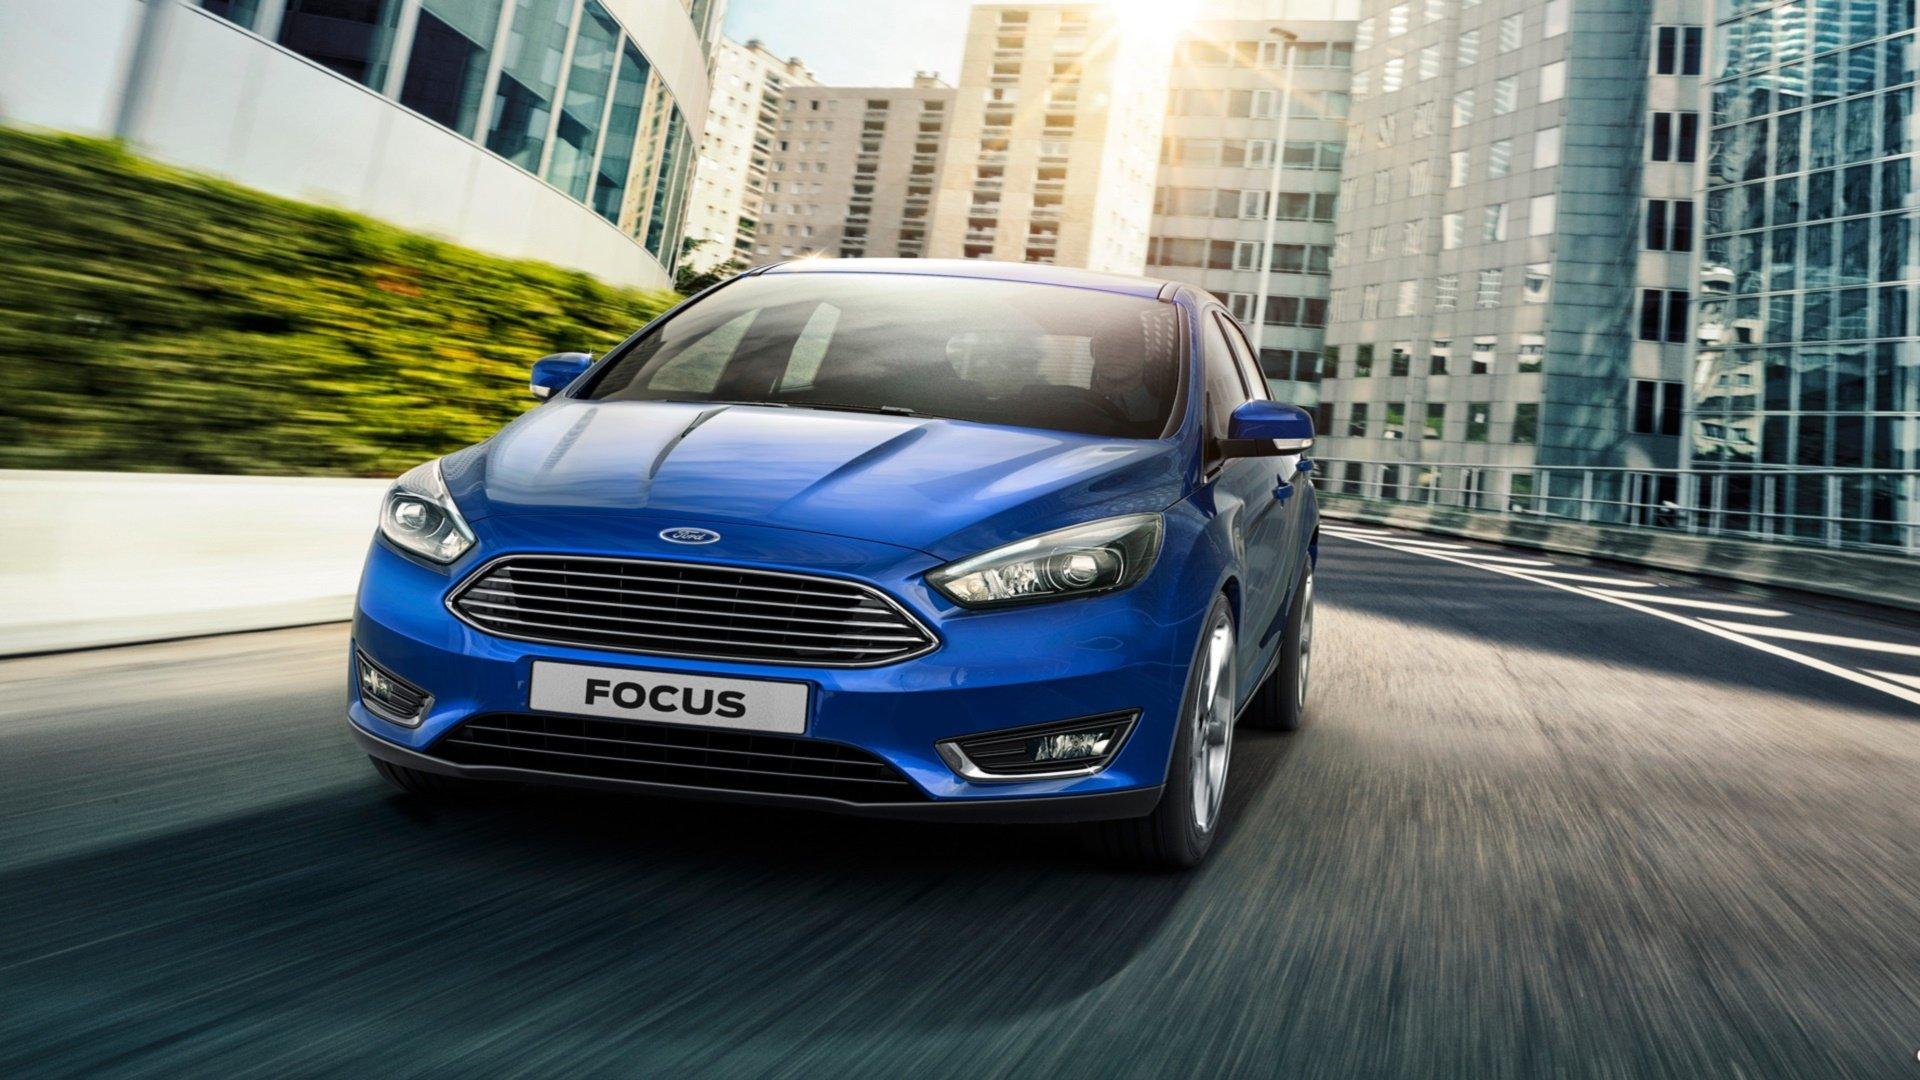 6 2015 Ford Focus Fondos De Pantalla Hd Fondos De